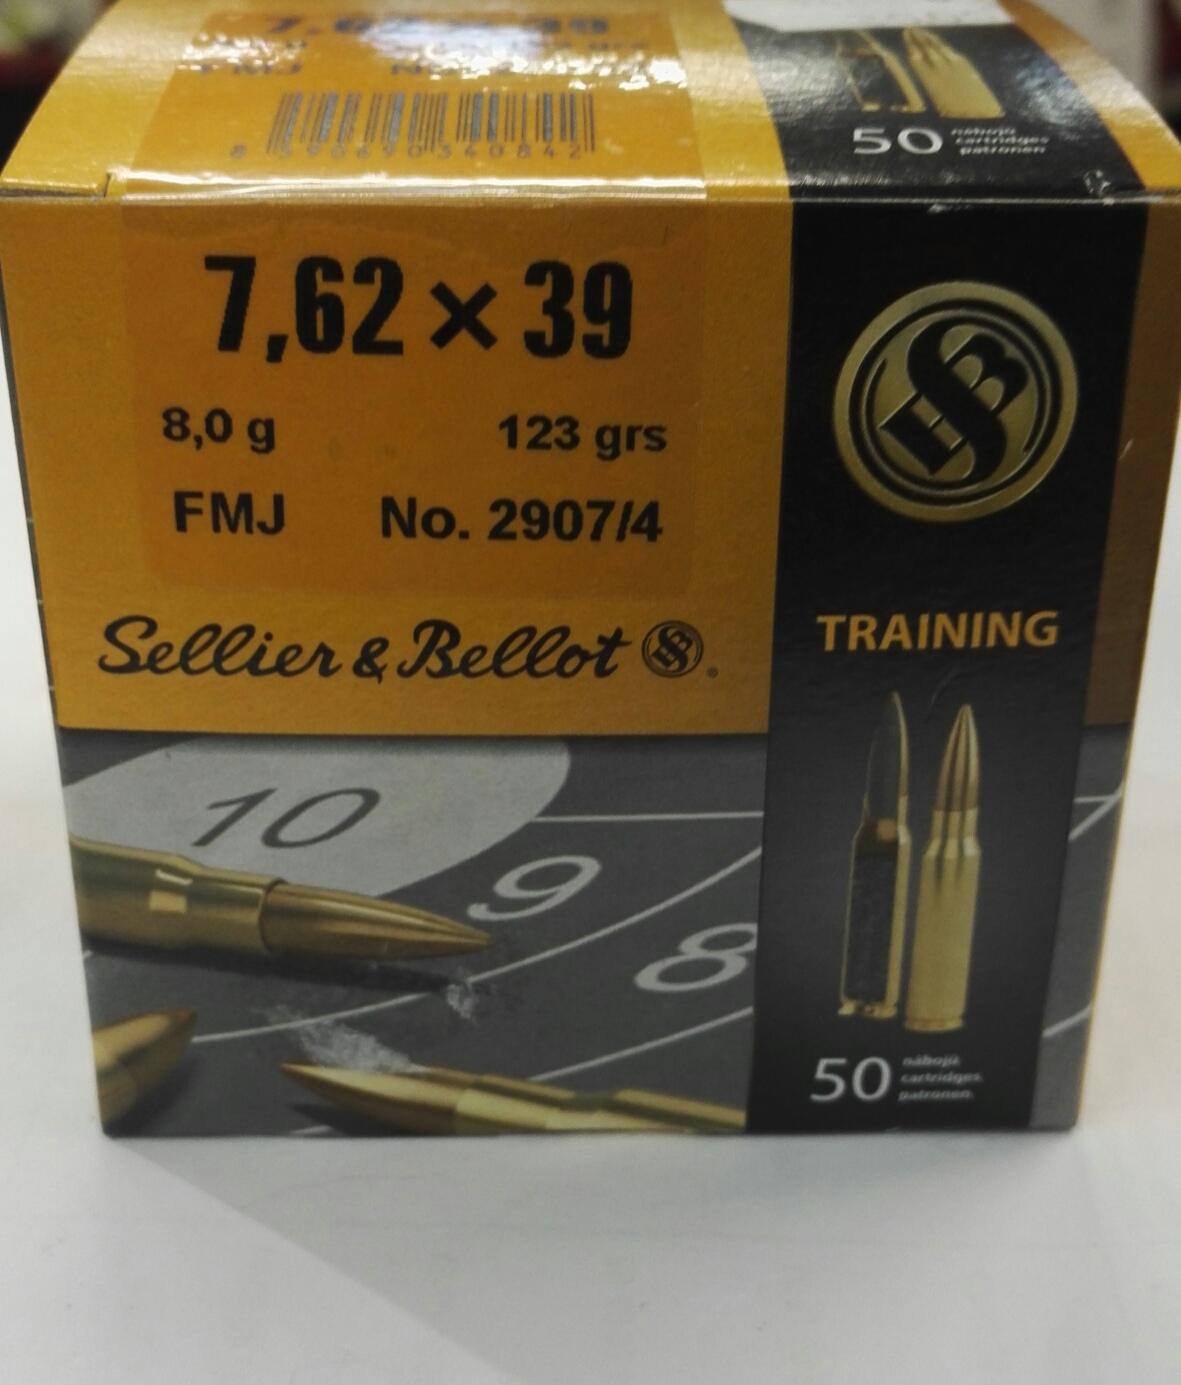 Sellier & Bellot 7.62x39 8 g / 123 gr